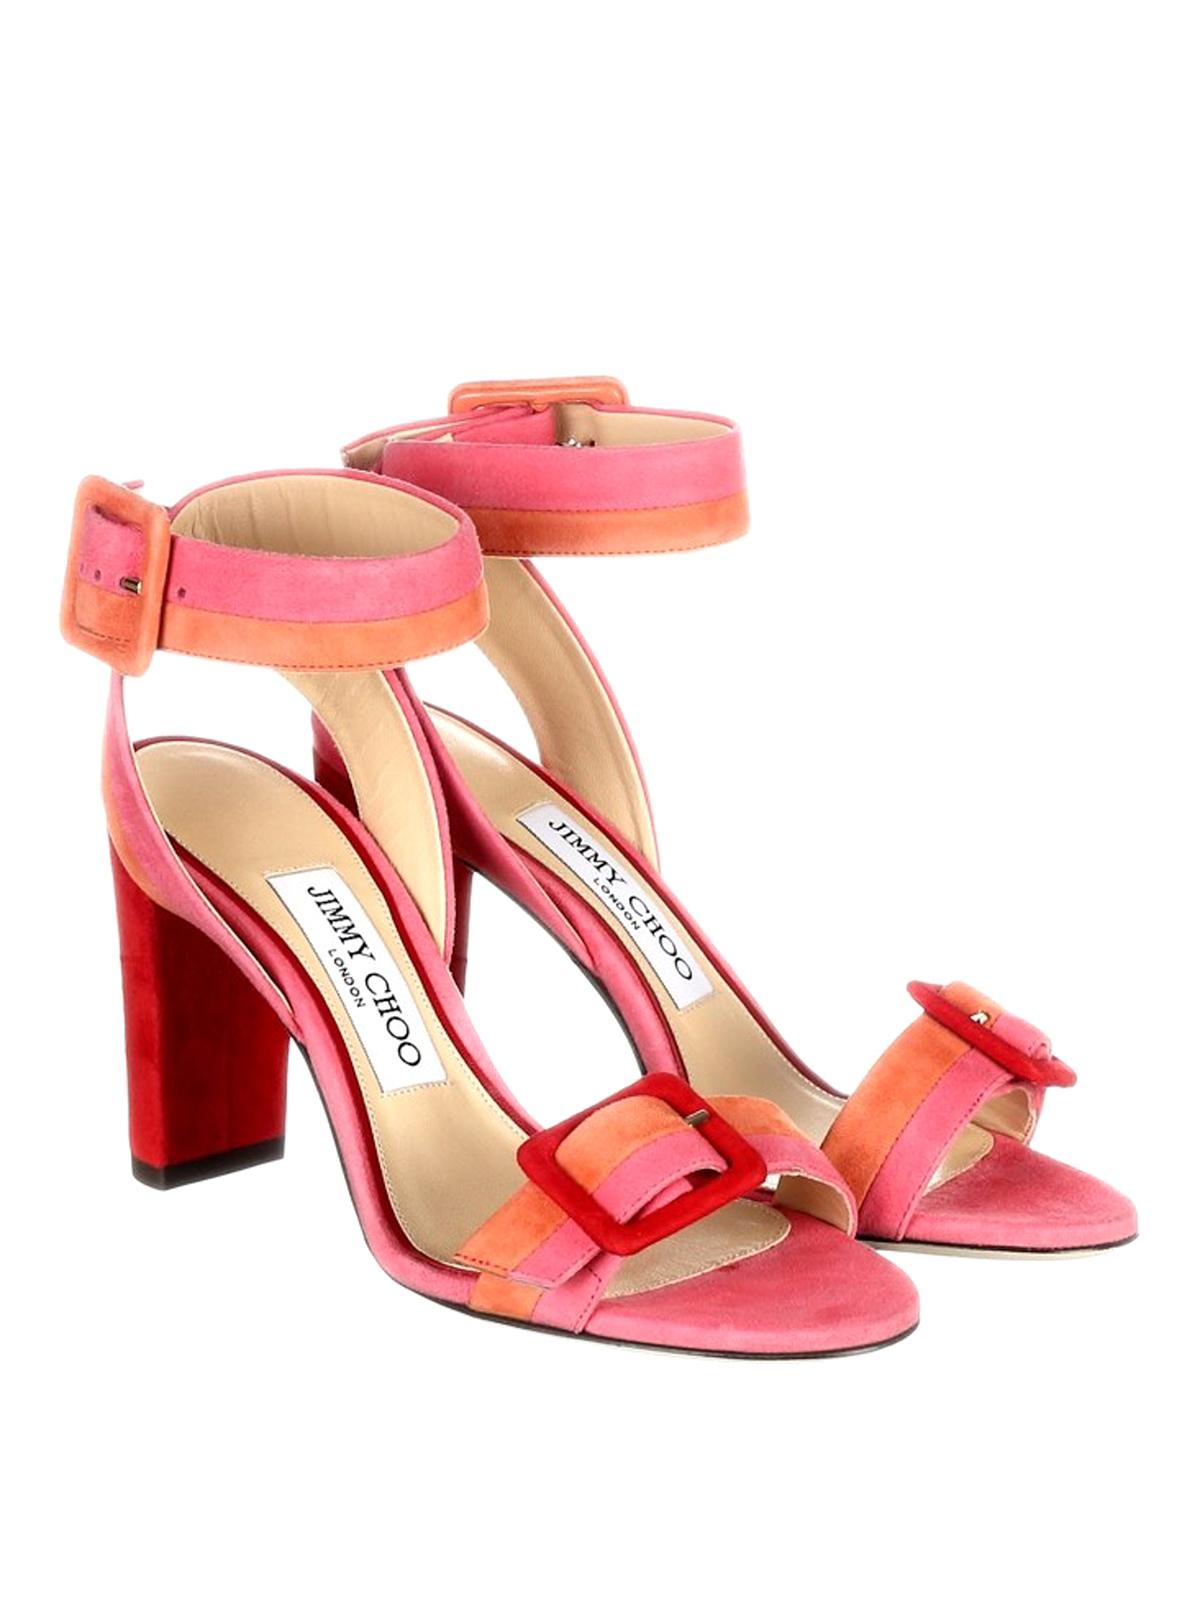 Sandales en daim Dacha 85Jimmy Choo London JlW4Q